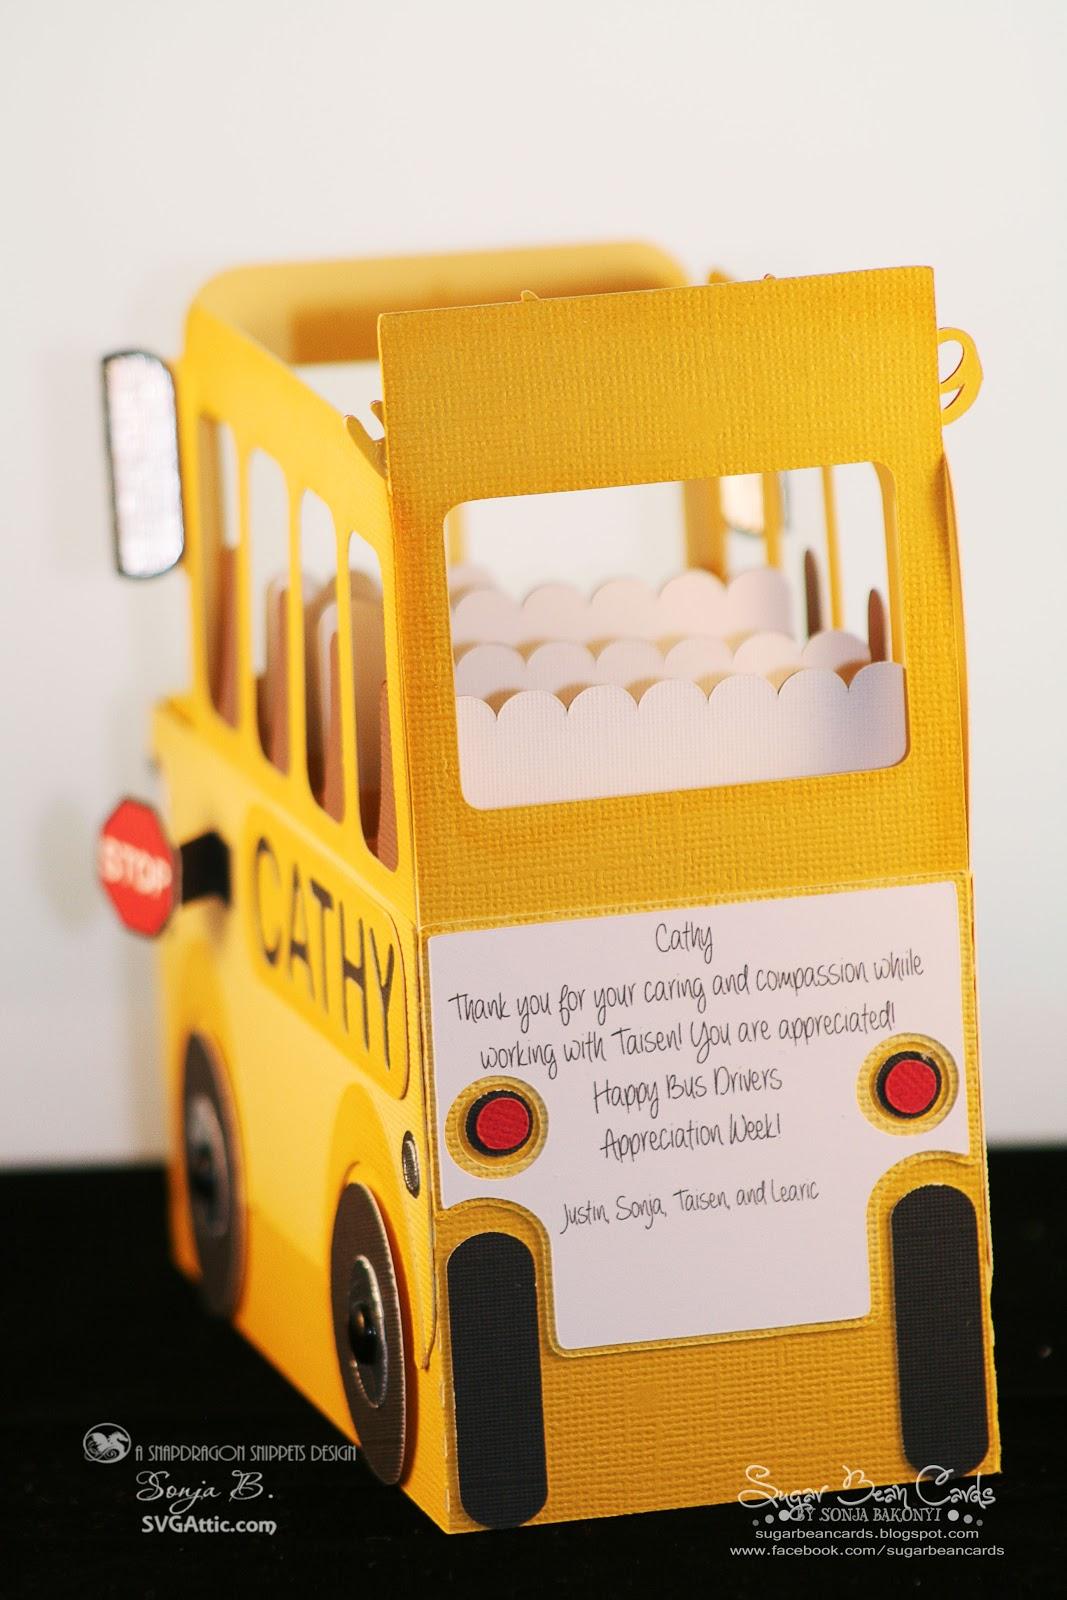 Svg Attic Blog Bus Driver Appreciation Week